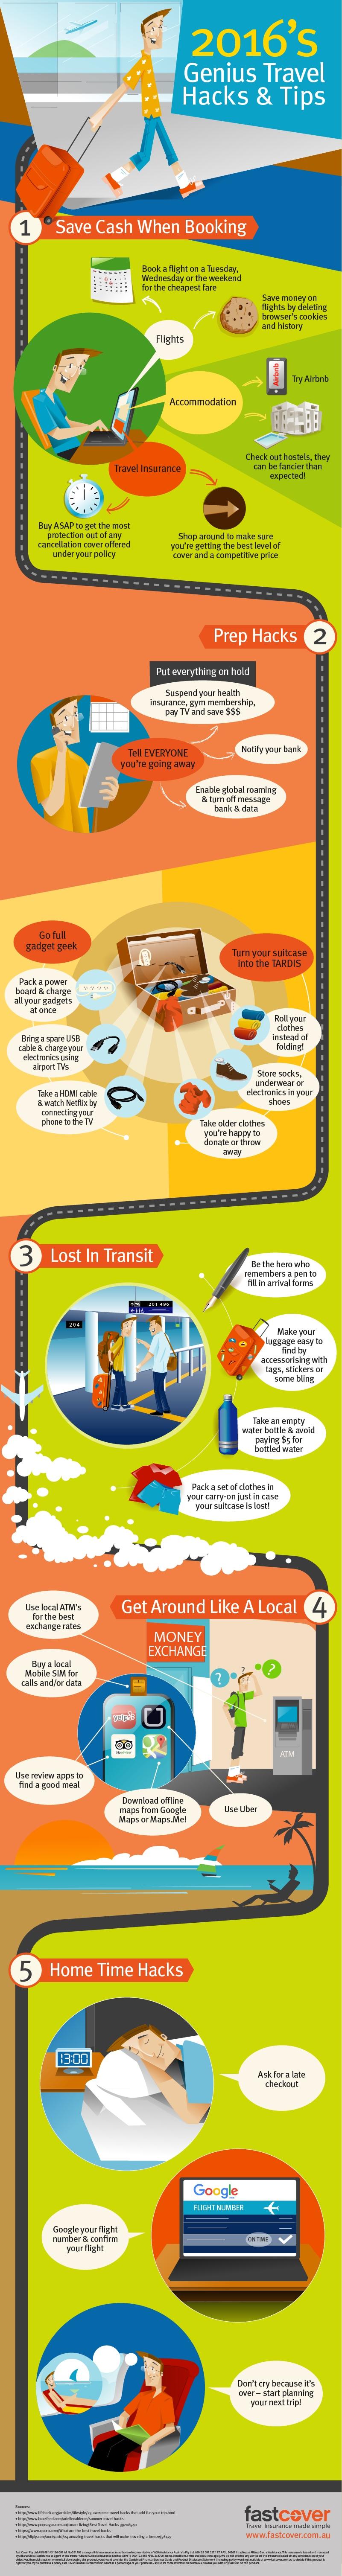 fast-covers-genius-2016s-travel-hacks-tips1